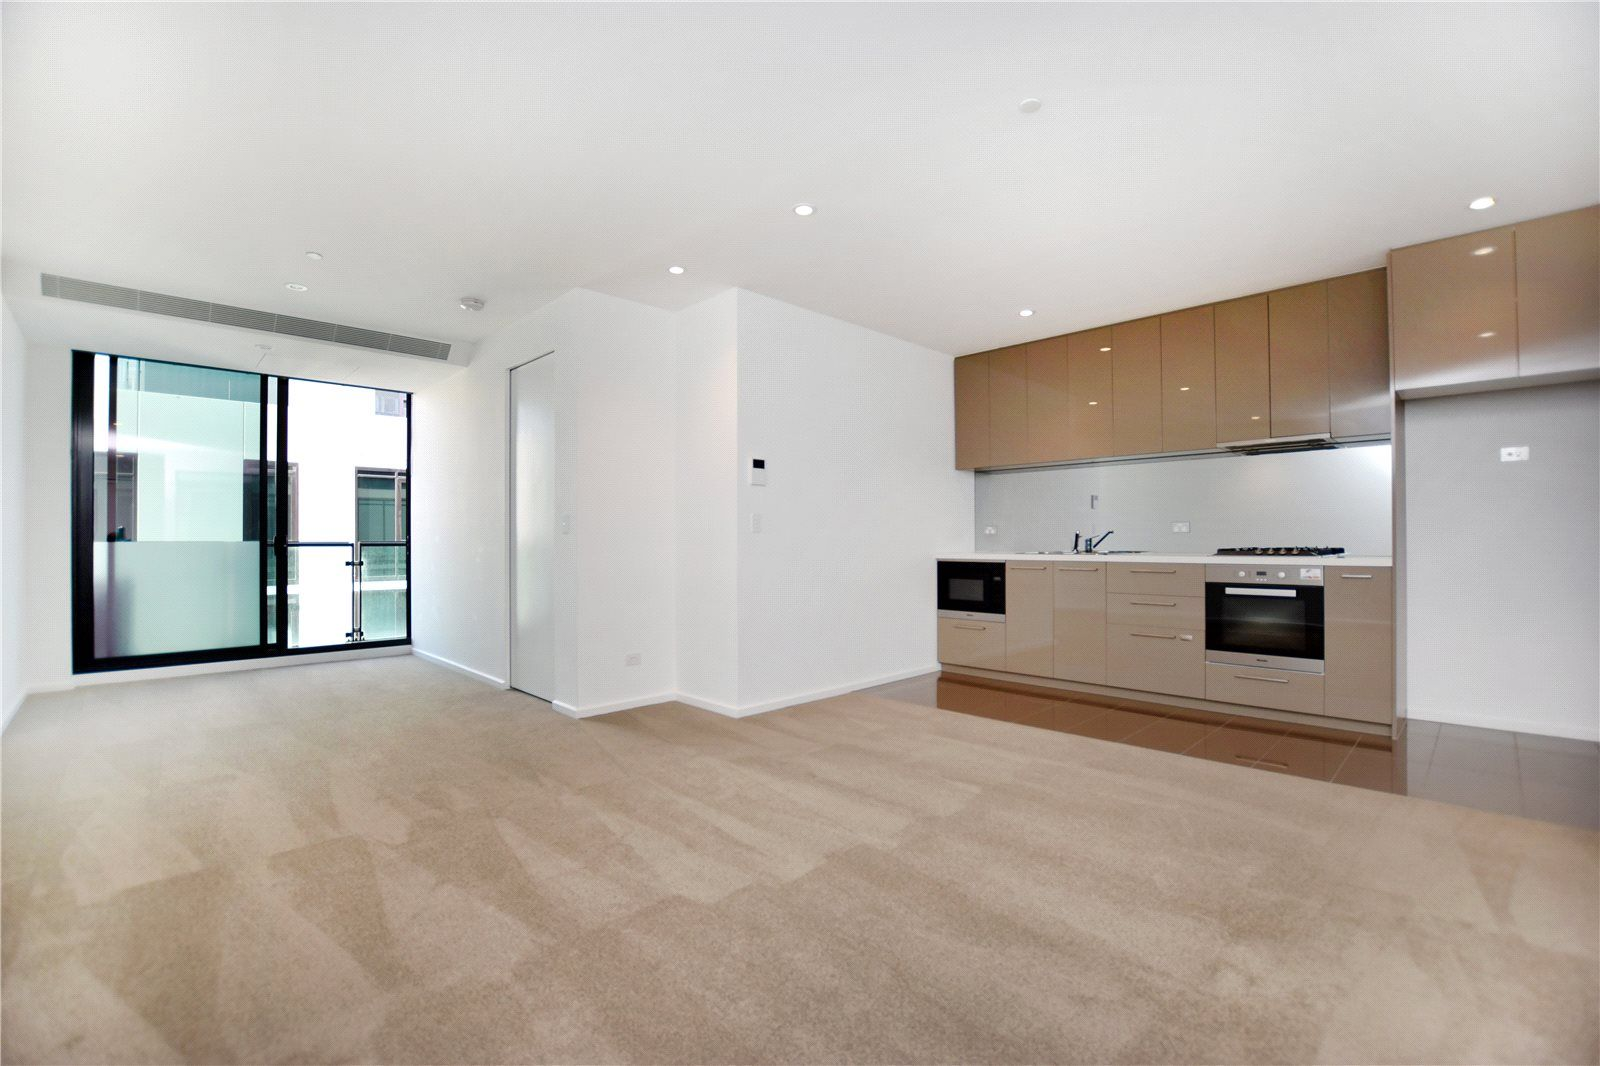 Australis: Fantastic Two Bedroom Apartment with Brilliant Building Facilities!